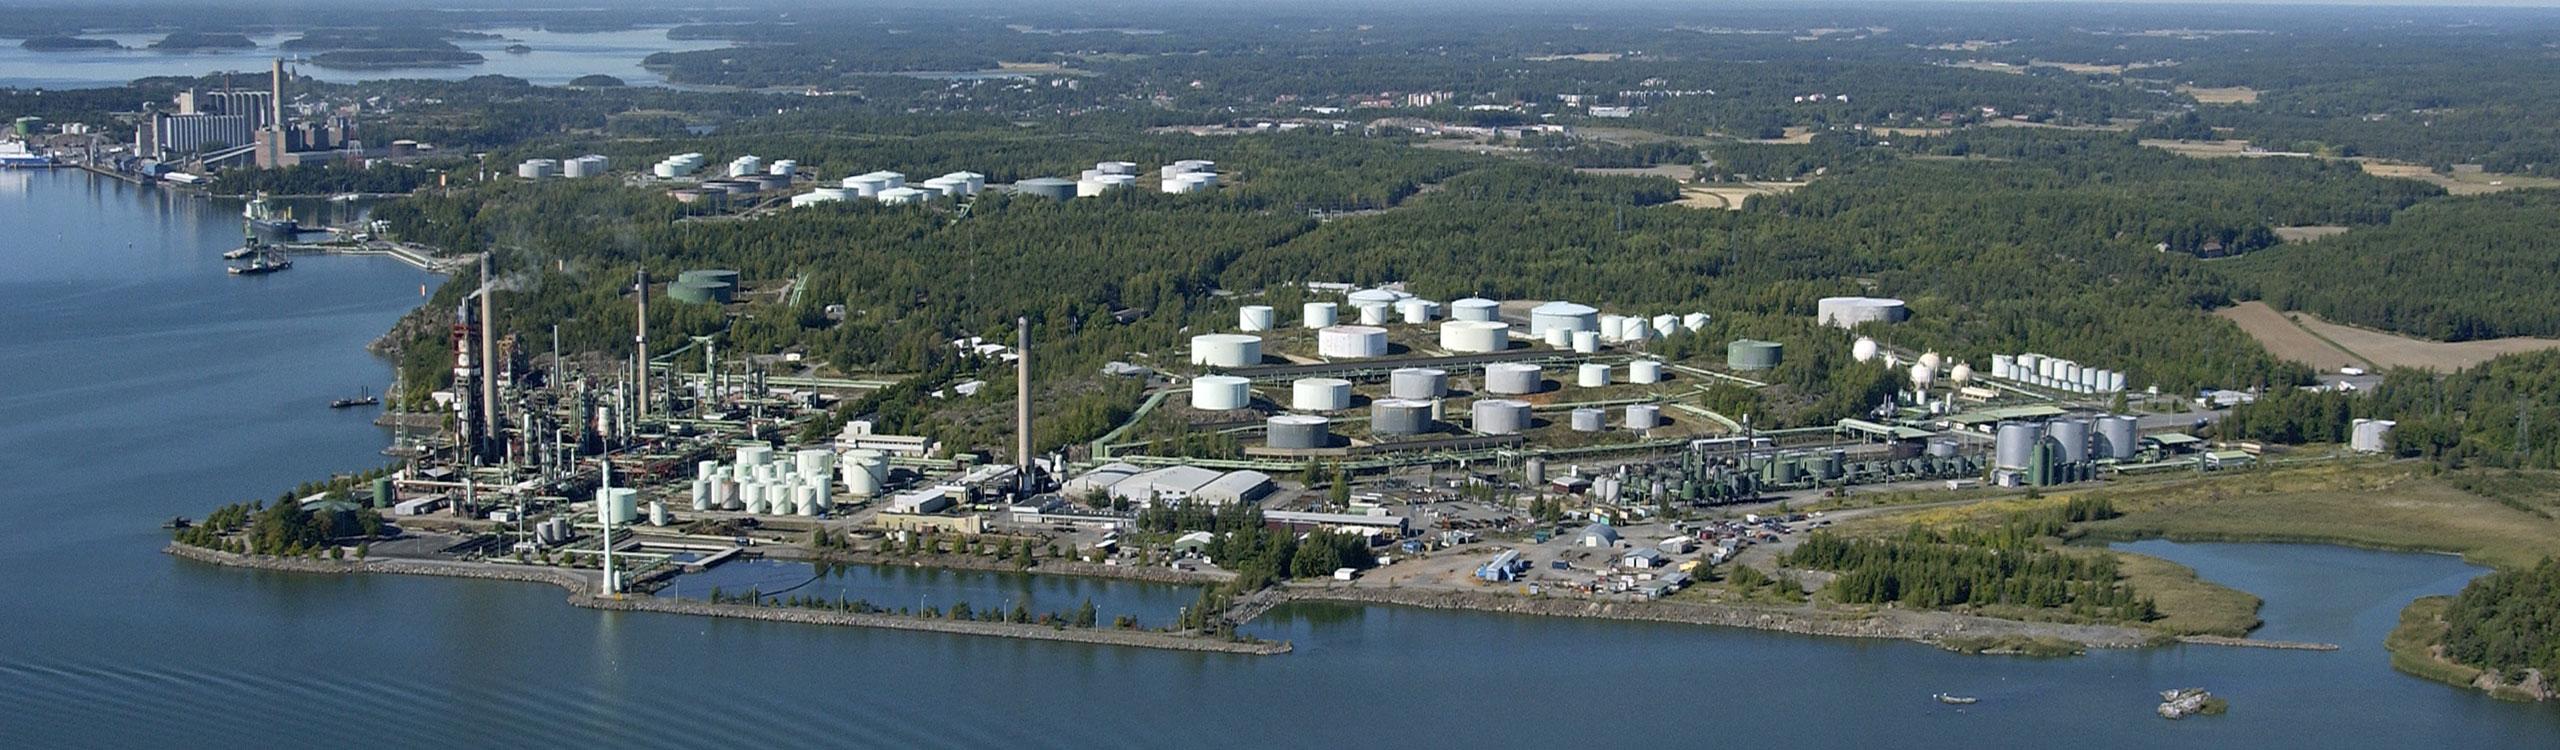 Process disruption accelerates Neste's Porvoo refinery maintenance